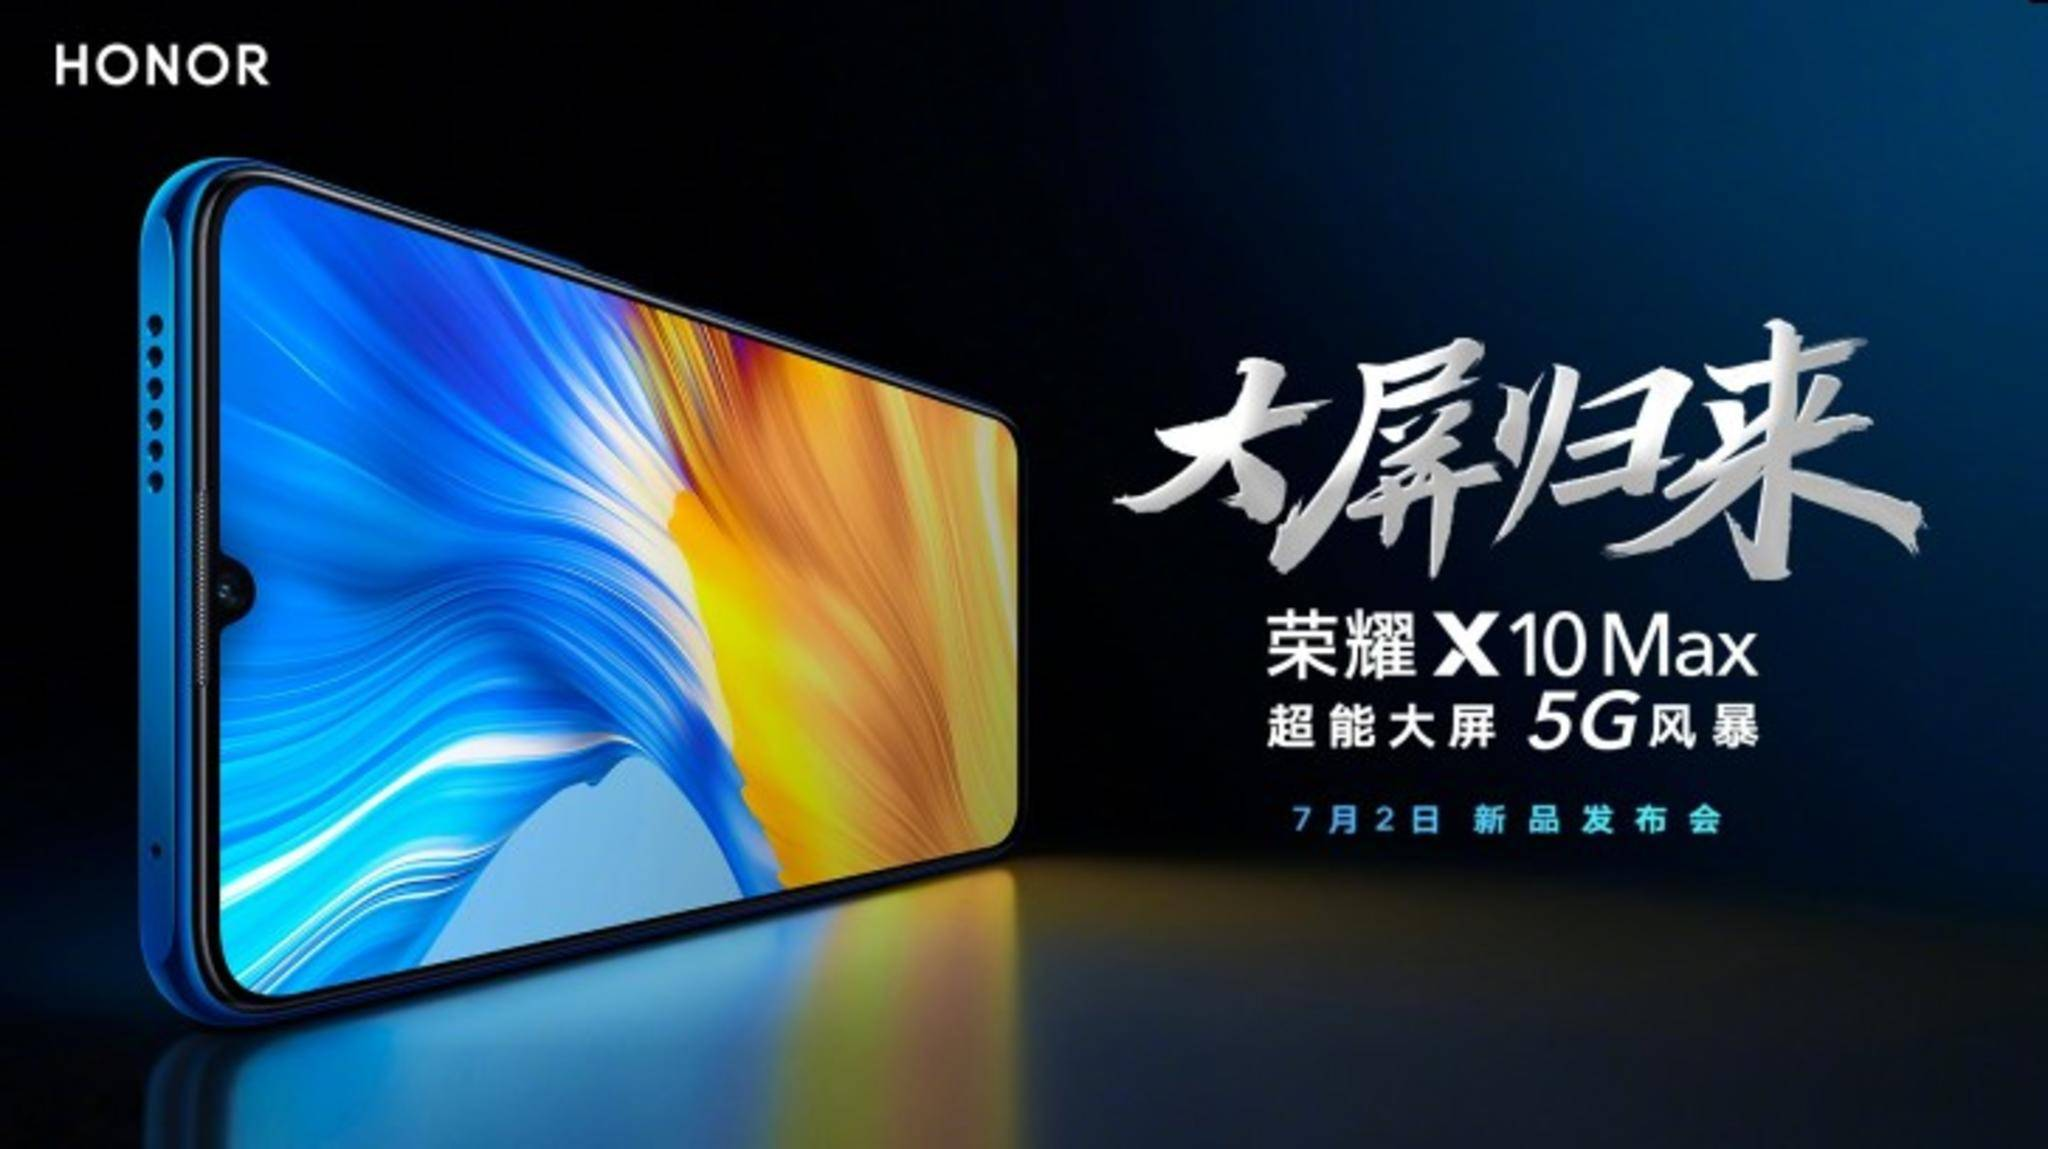 honor-x10-max-5g-weibo